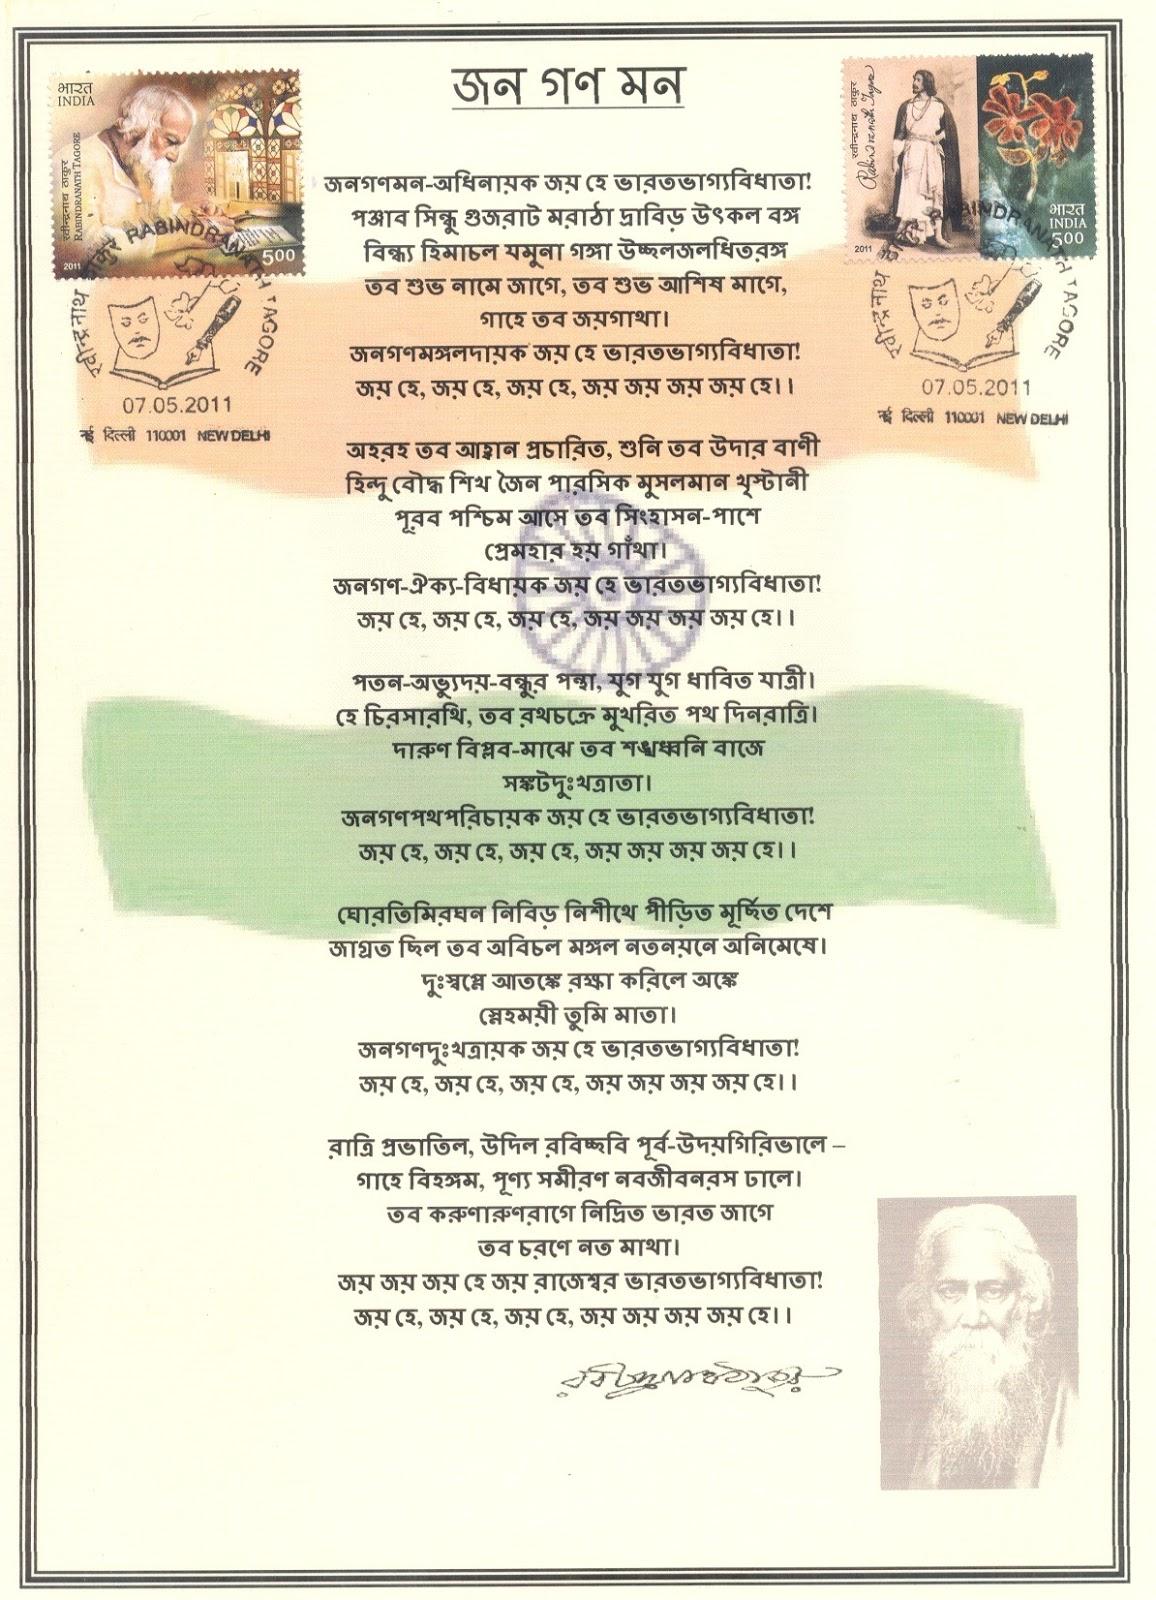 Hindi translation of 'contribution'